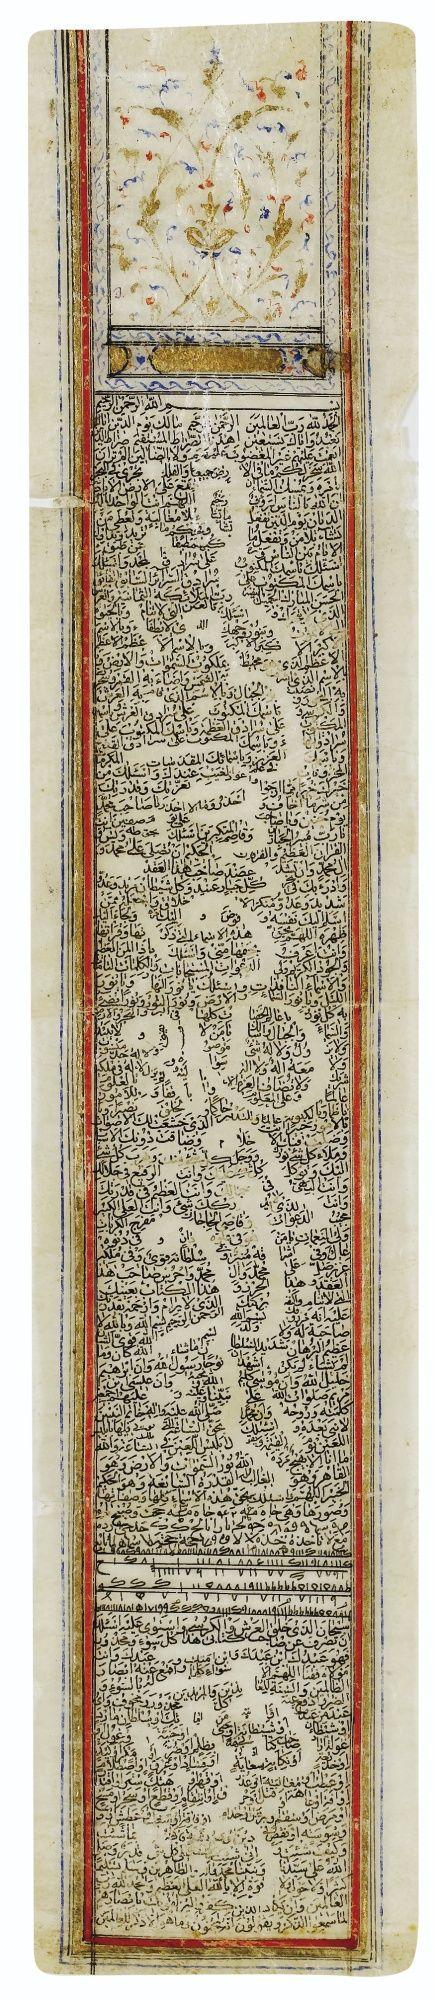 DesertRose,;,TWO CALLIGRAPHIC TALISMANIC CHARTS ON GAZELLE SKIN: HIRZ IMÂM MUHAMMAD TAQI, QAJAR PERSIA, 19TH CENTURY (ONE DATED: AH1303/1883AD),;,